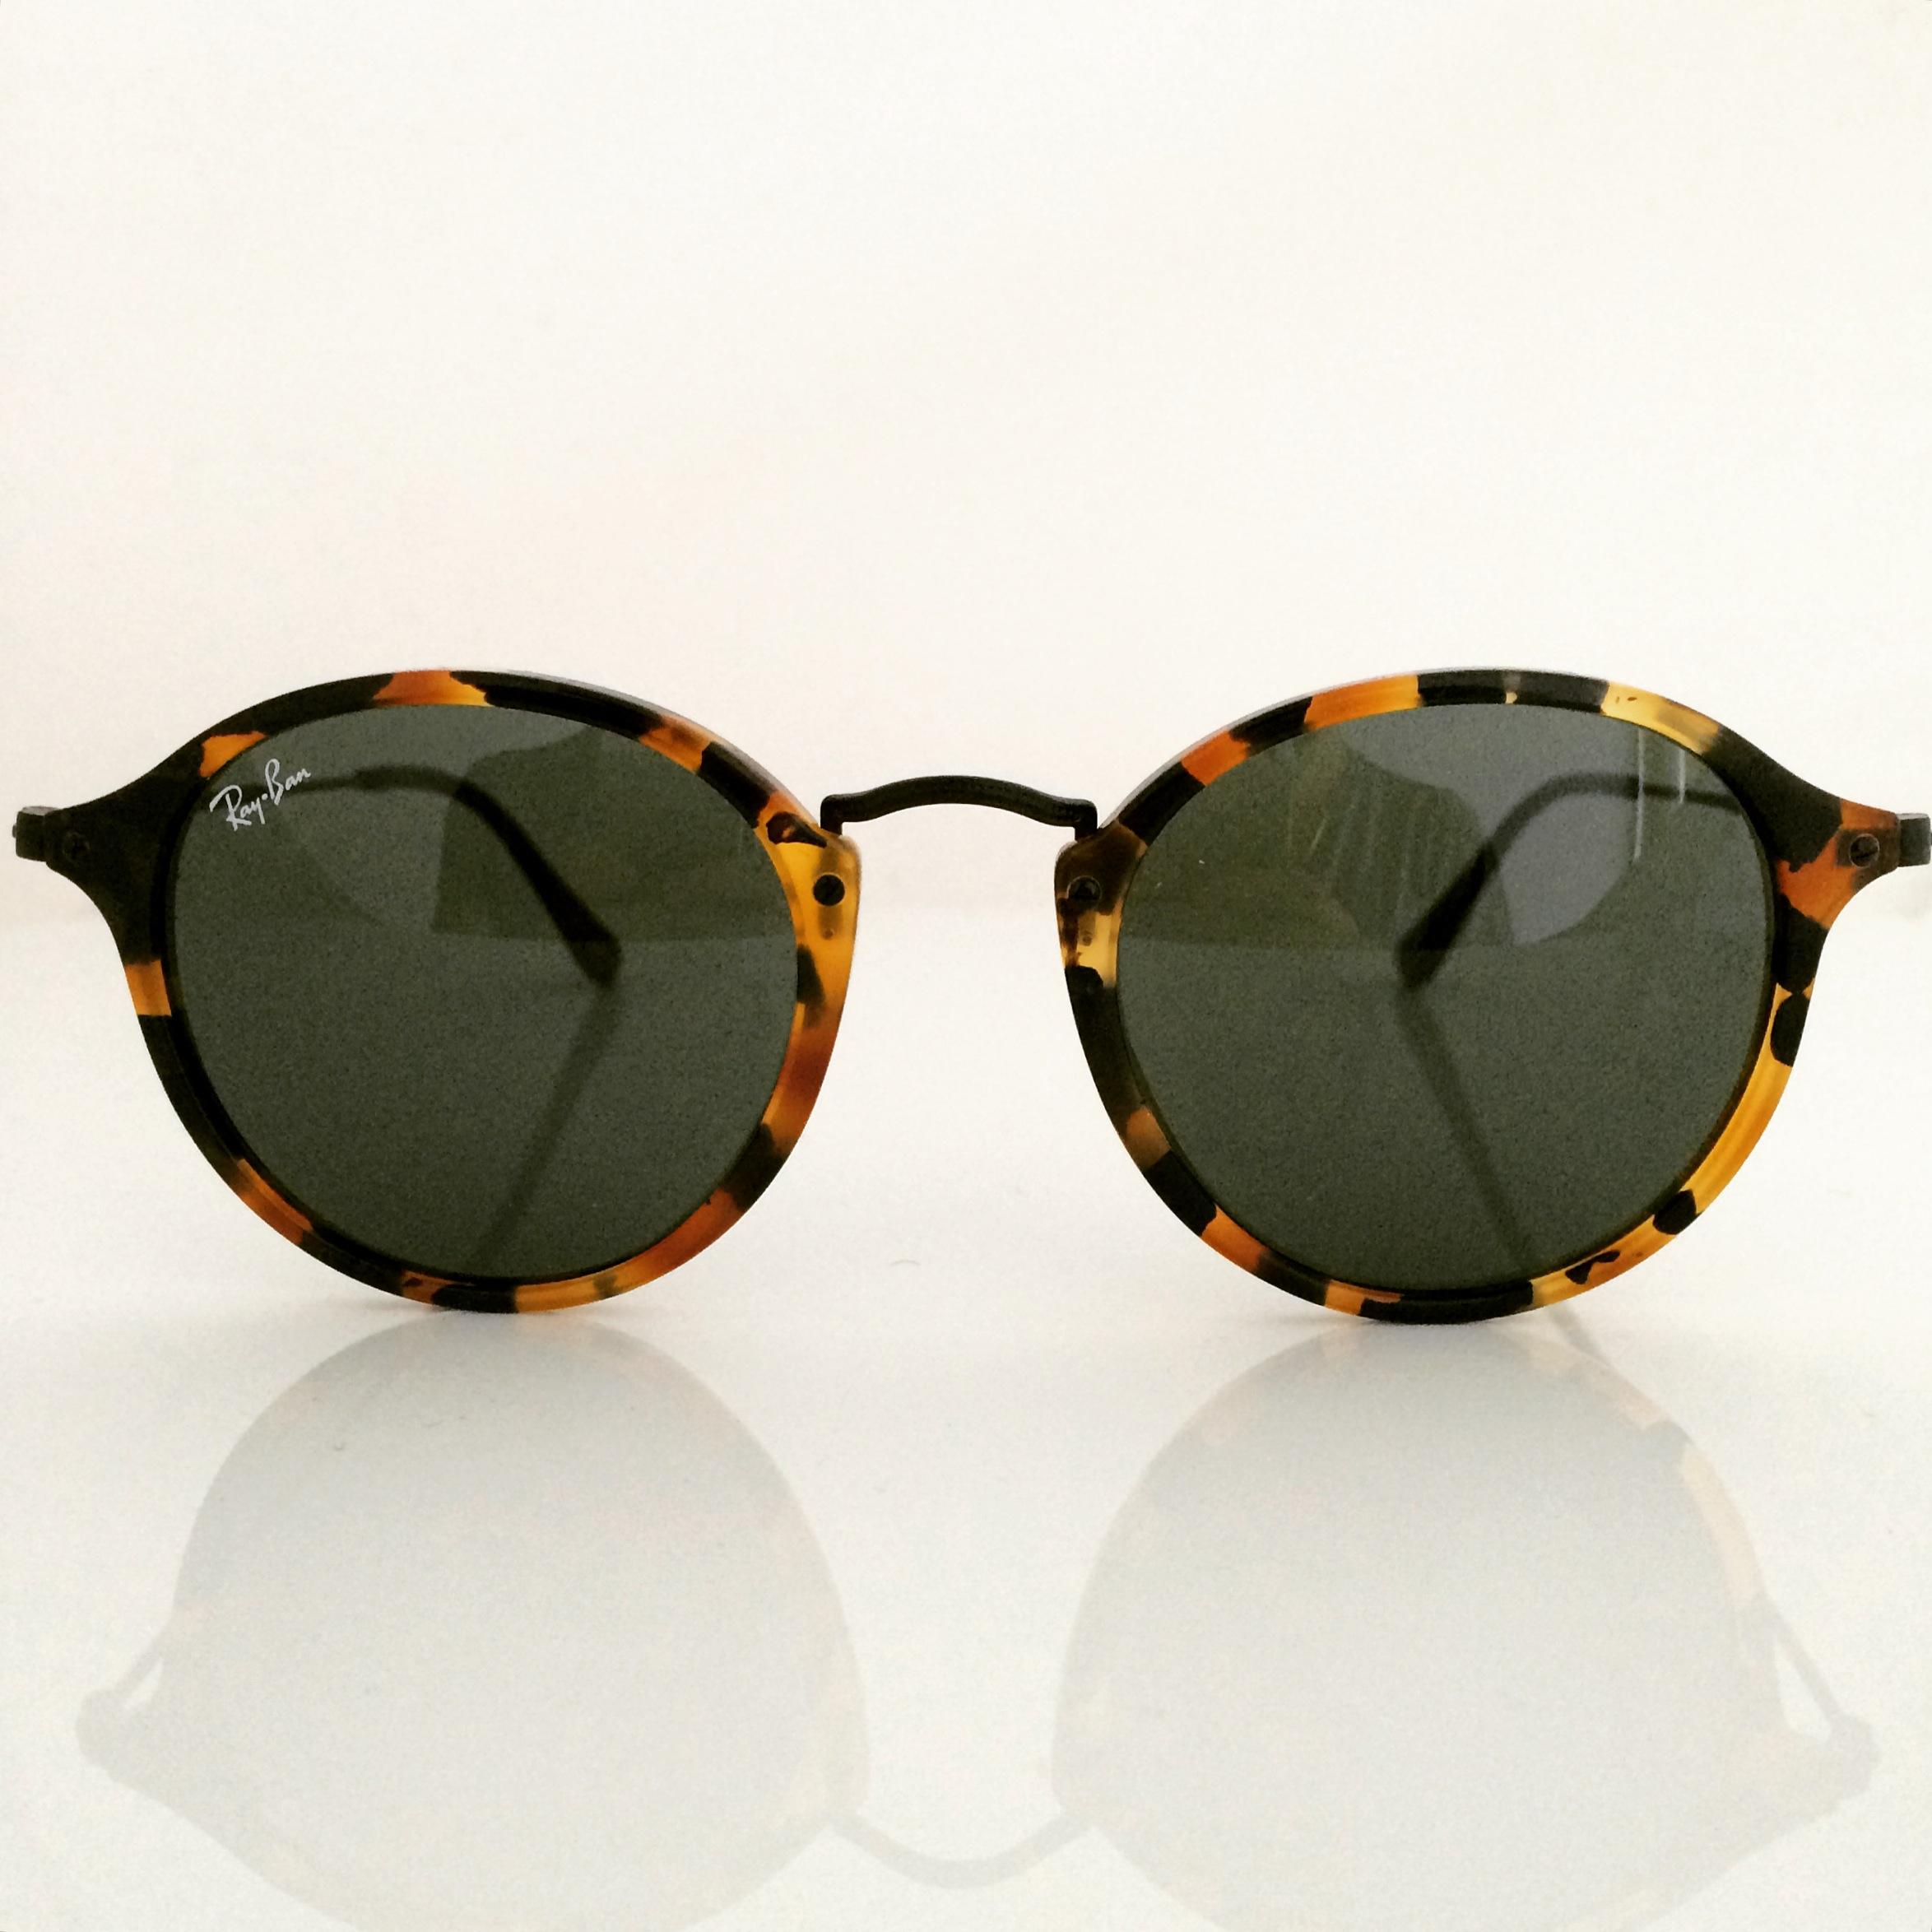 rayban 2447 sunglasses